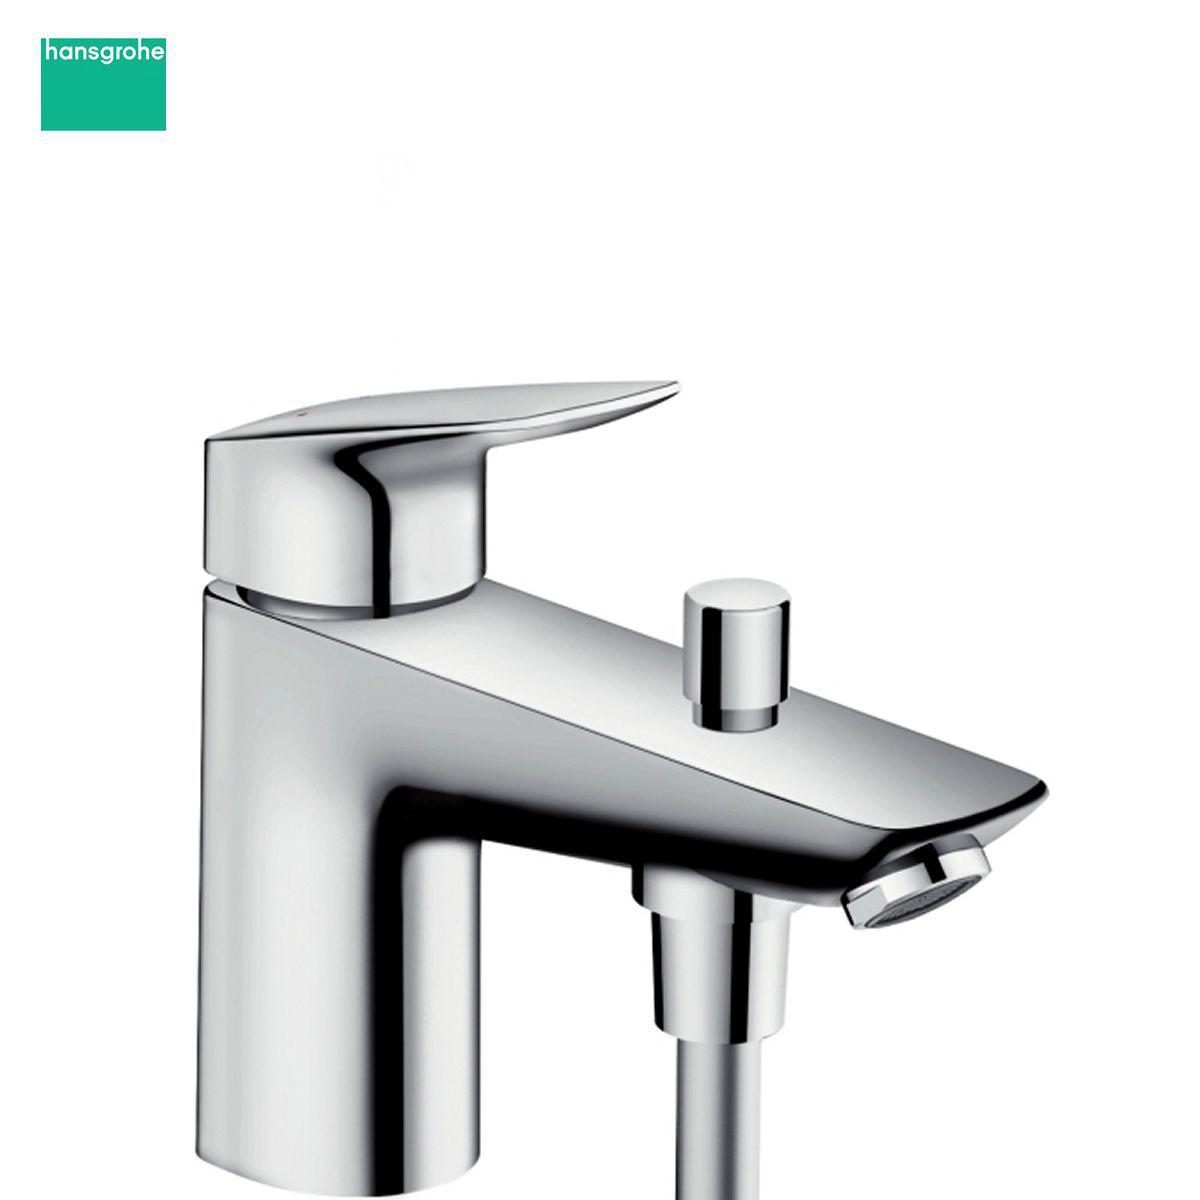 Hansgrohe Logis Single Lever Bath Shower Mixer Uk Bathrooms